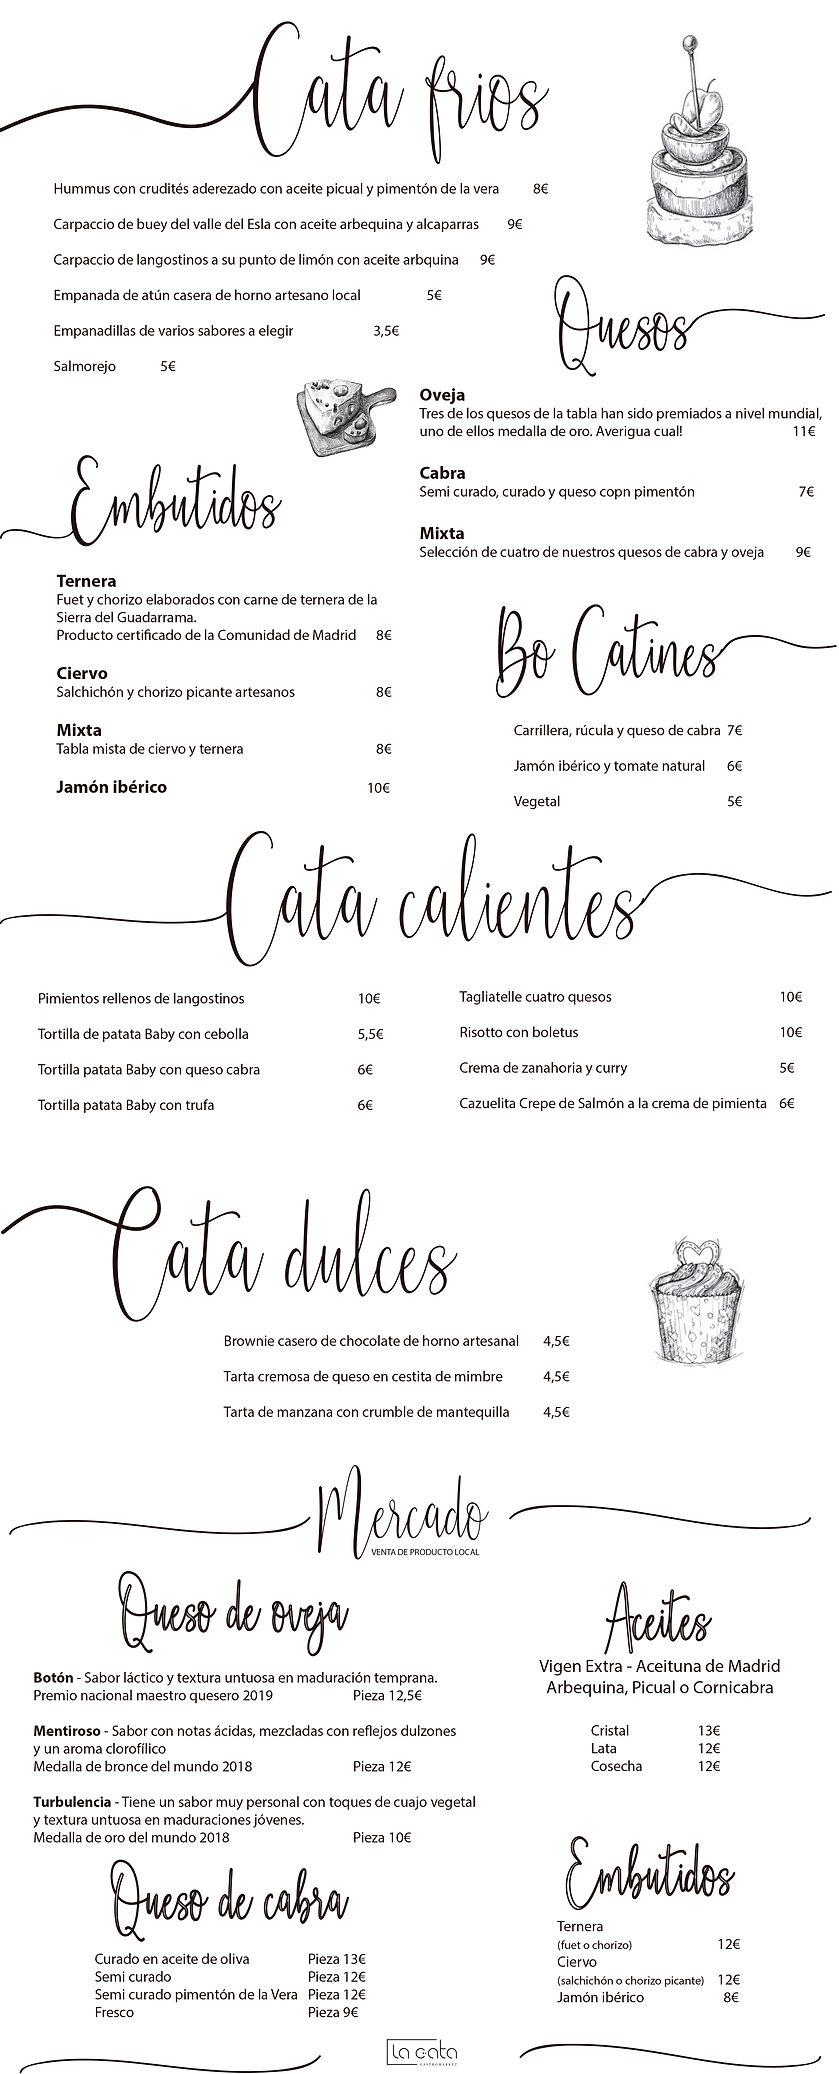 carta_la_cata_patones_de_arriba.jpg